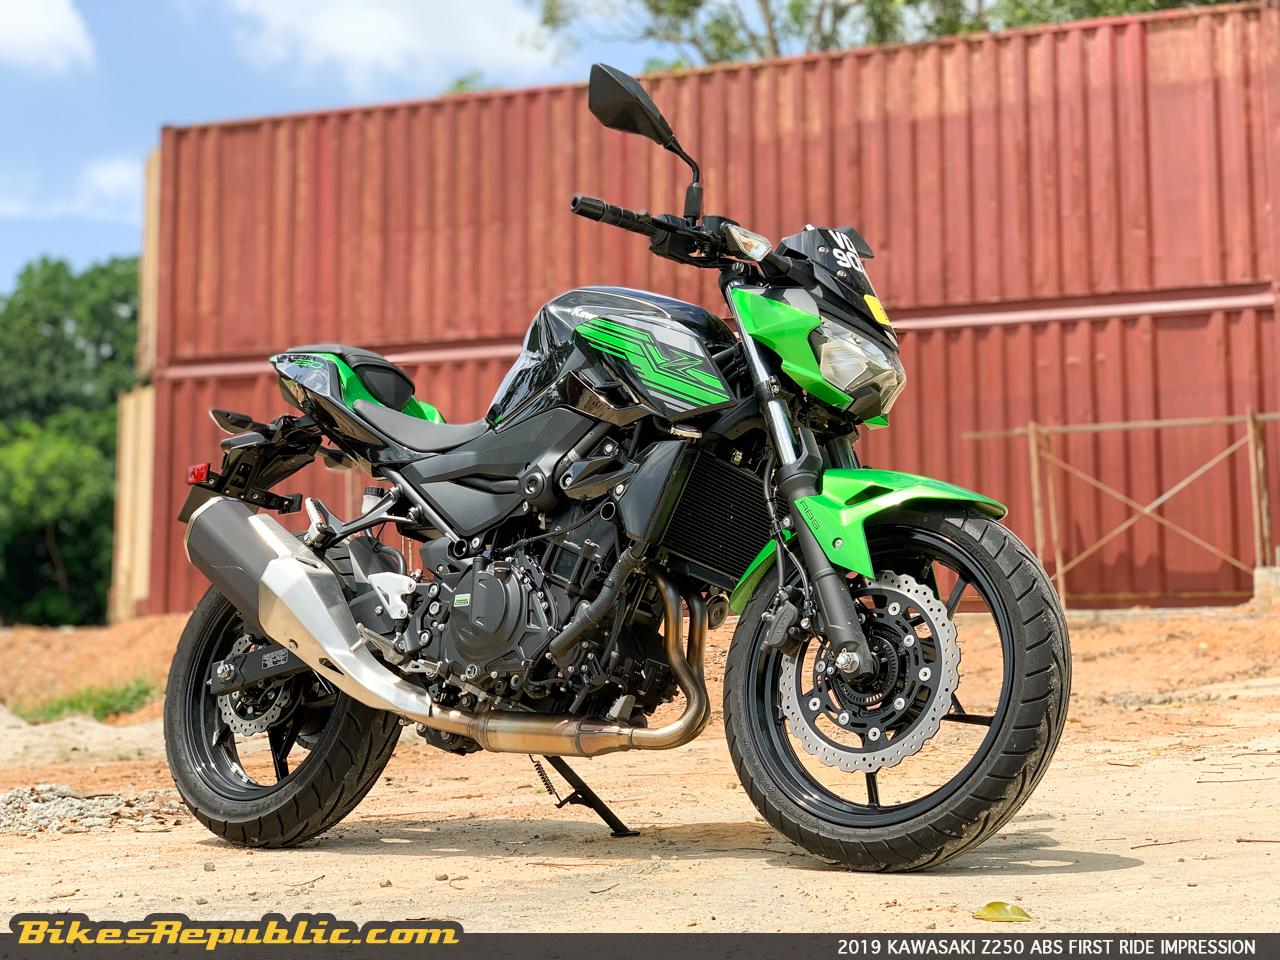 2019 Kawasaki Z250 Abs First Ride Review Bikesrepublic